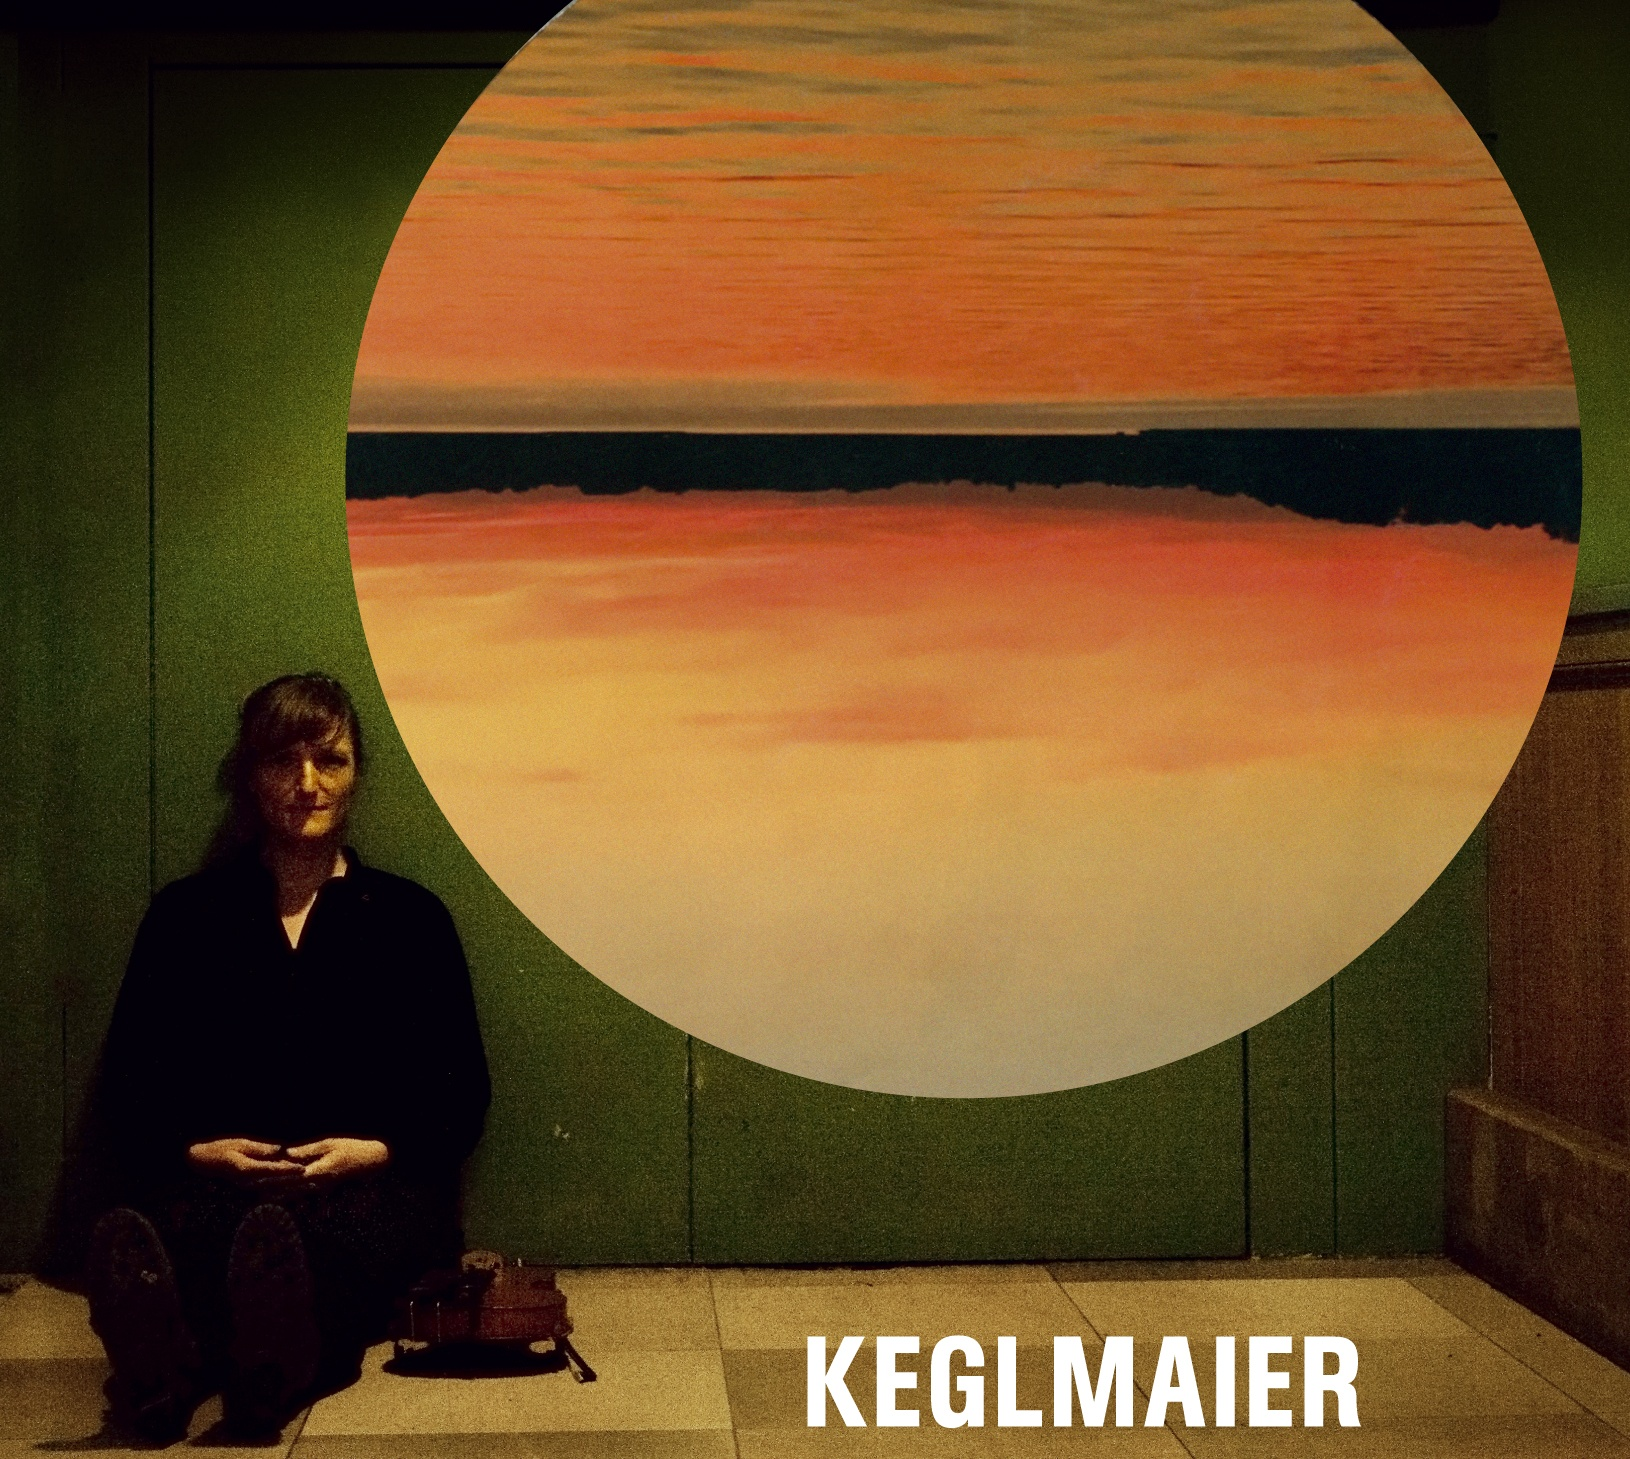 Evi Keglmaier